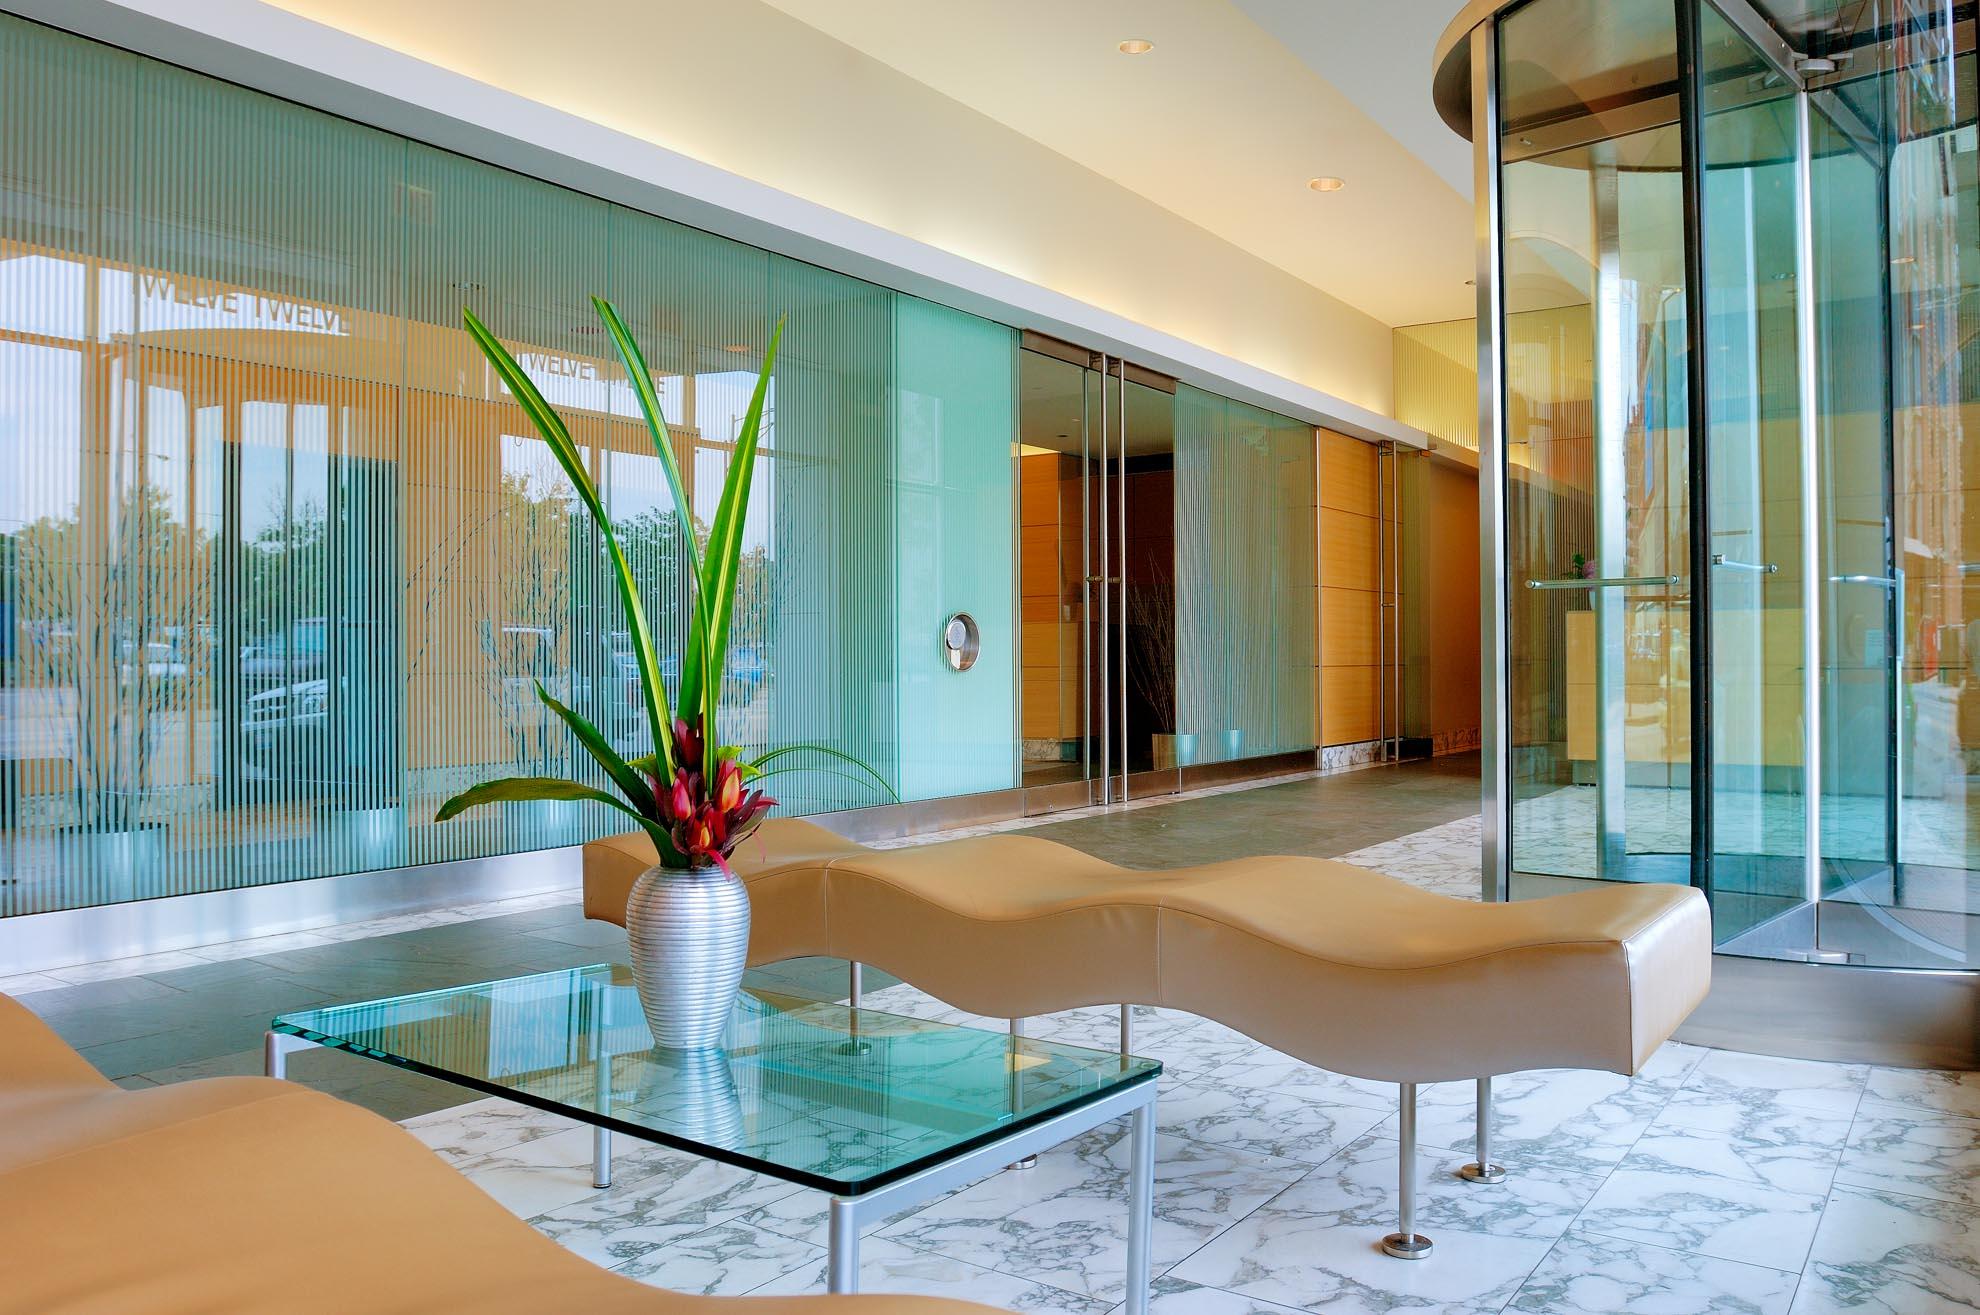 commercial photographer portfolio of interior architecture photography